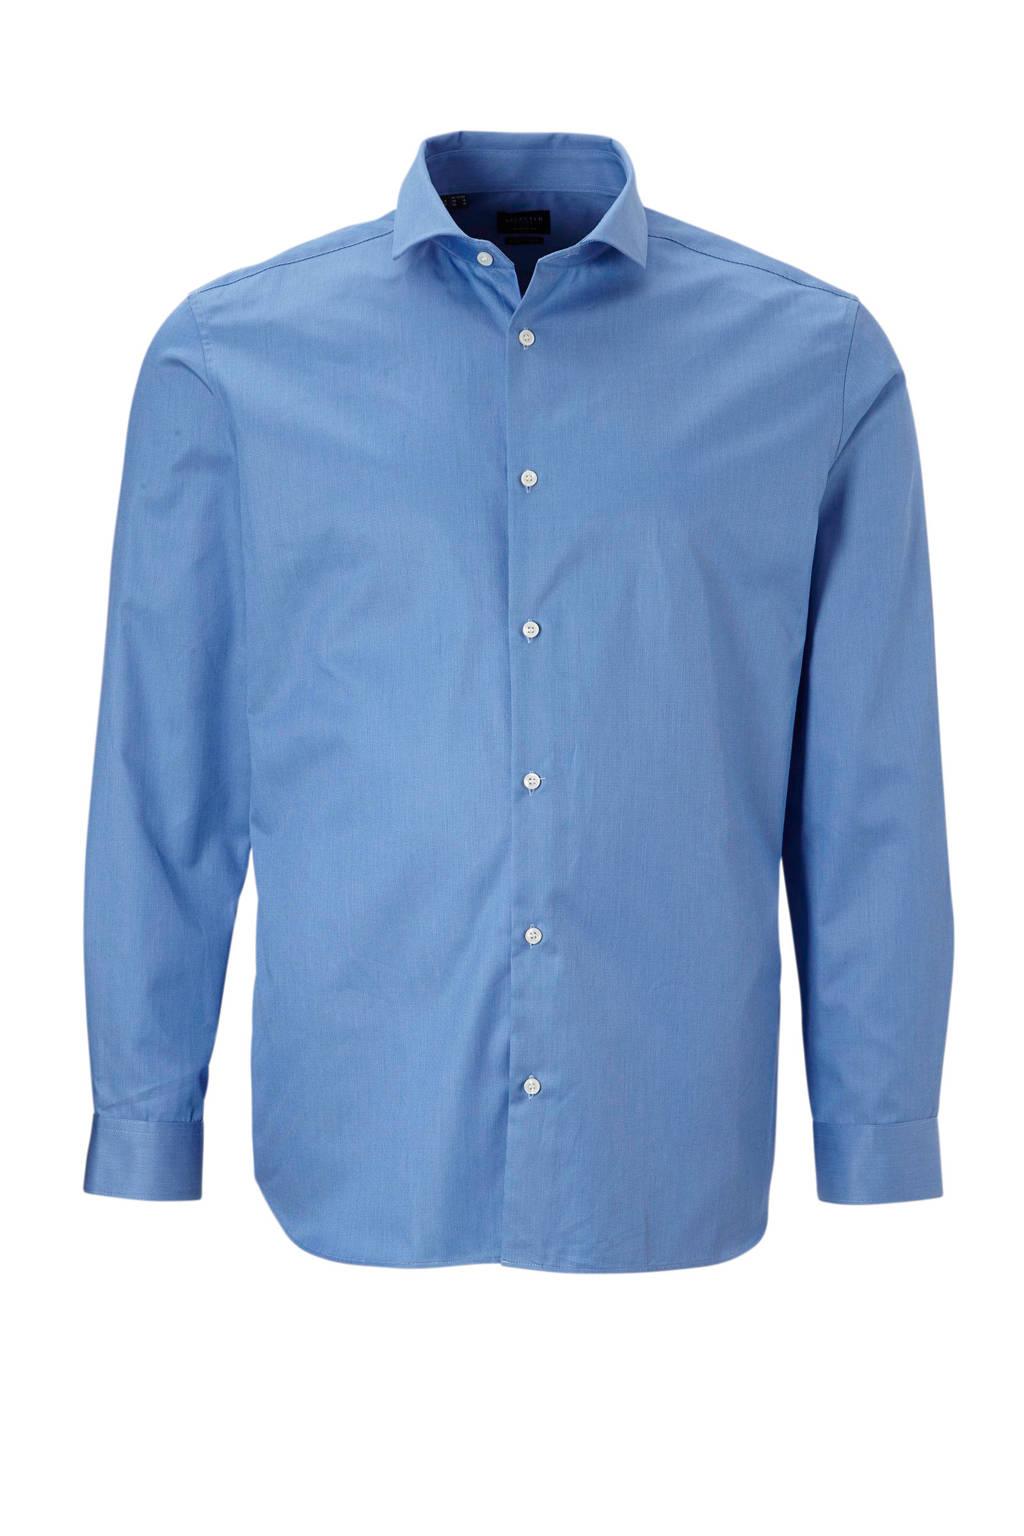 SELECTED HOMME overhemd blauw, Blauw